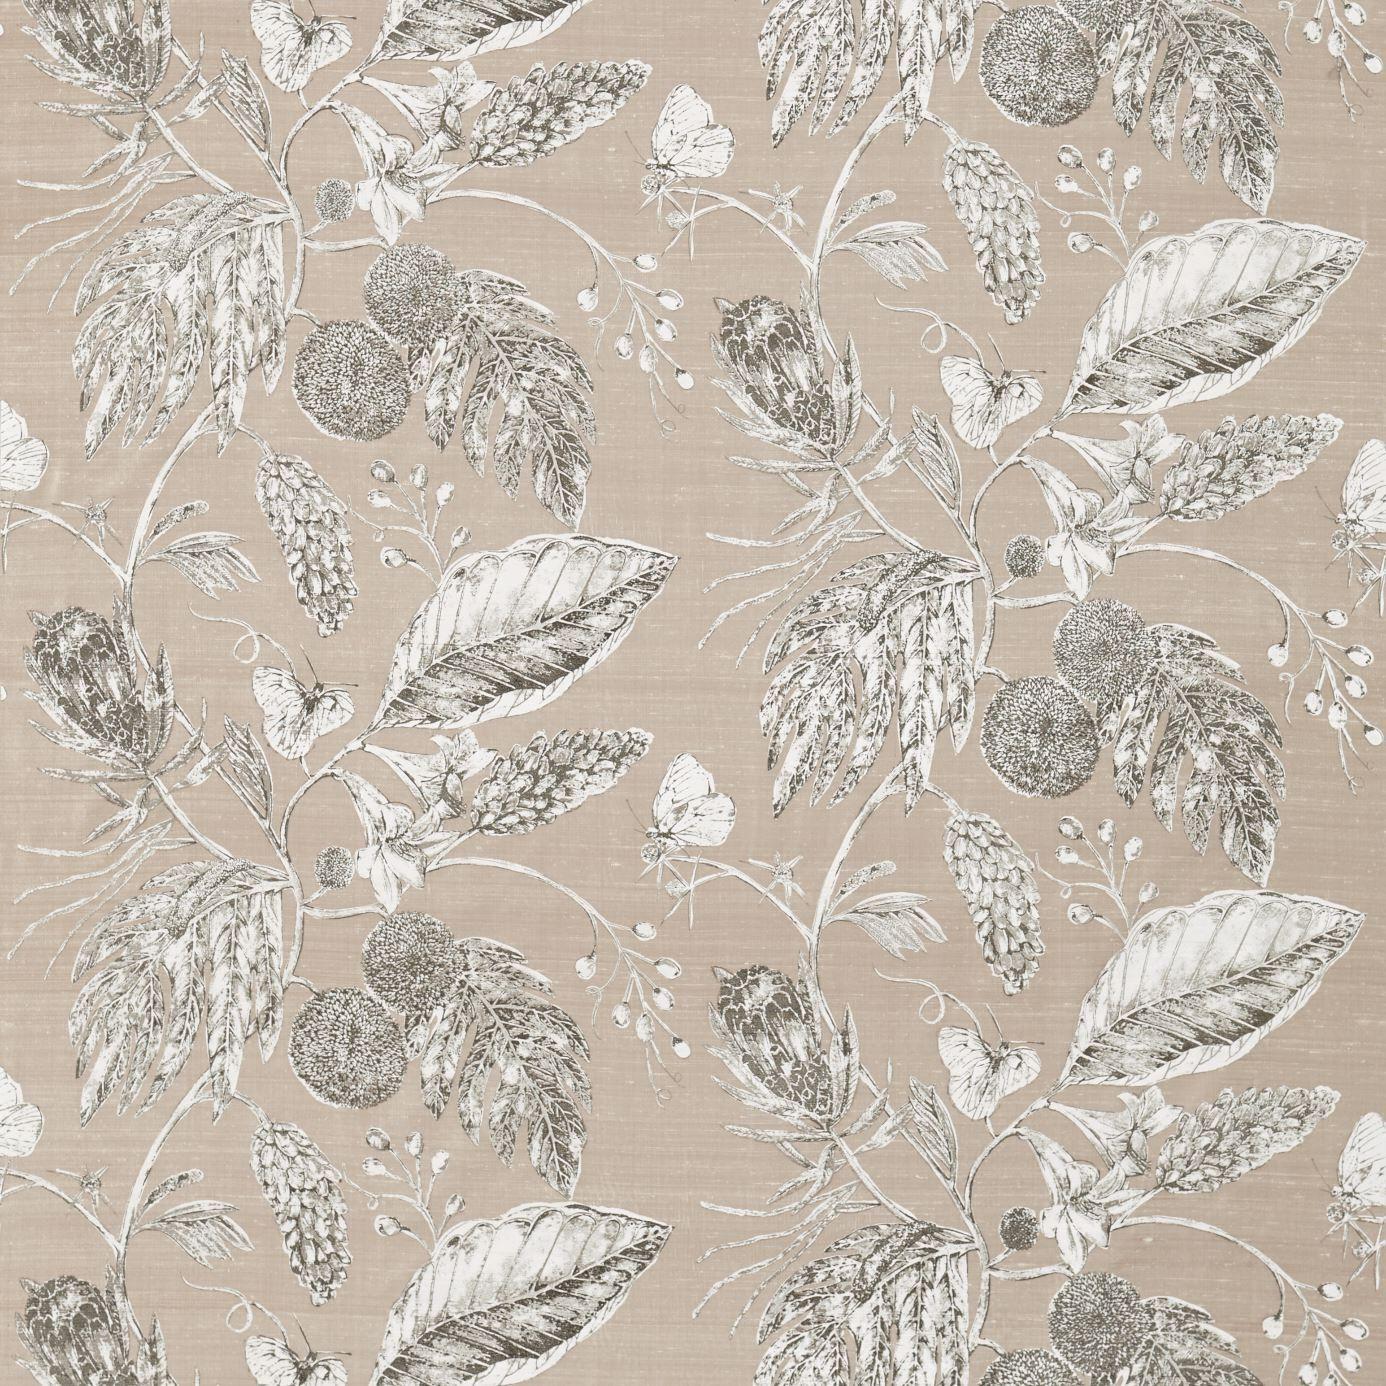 Products harlequin designer fabrics and wallpapers paradise - Products Harlequin Designer Fabrics And Wallpapers Amborella Silk Hgat120421 Palmetto